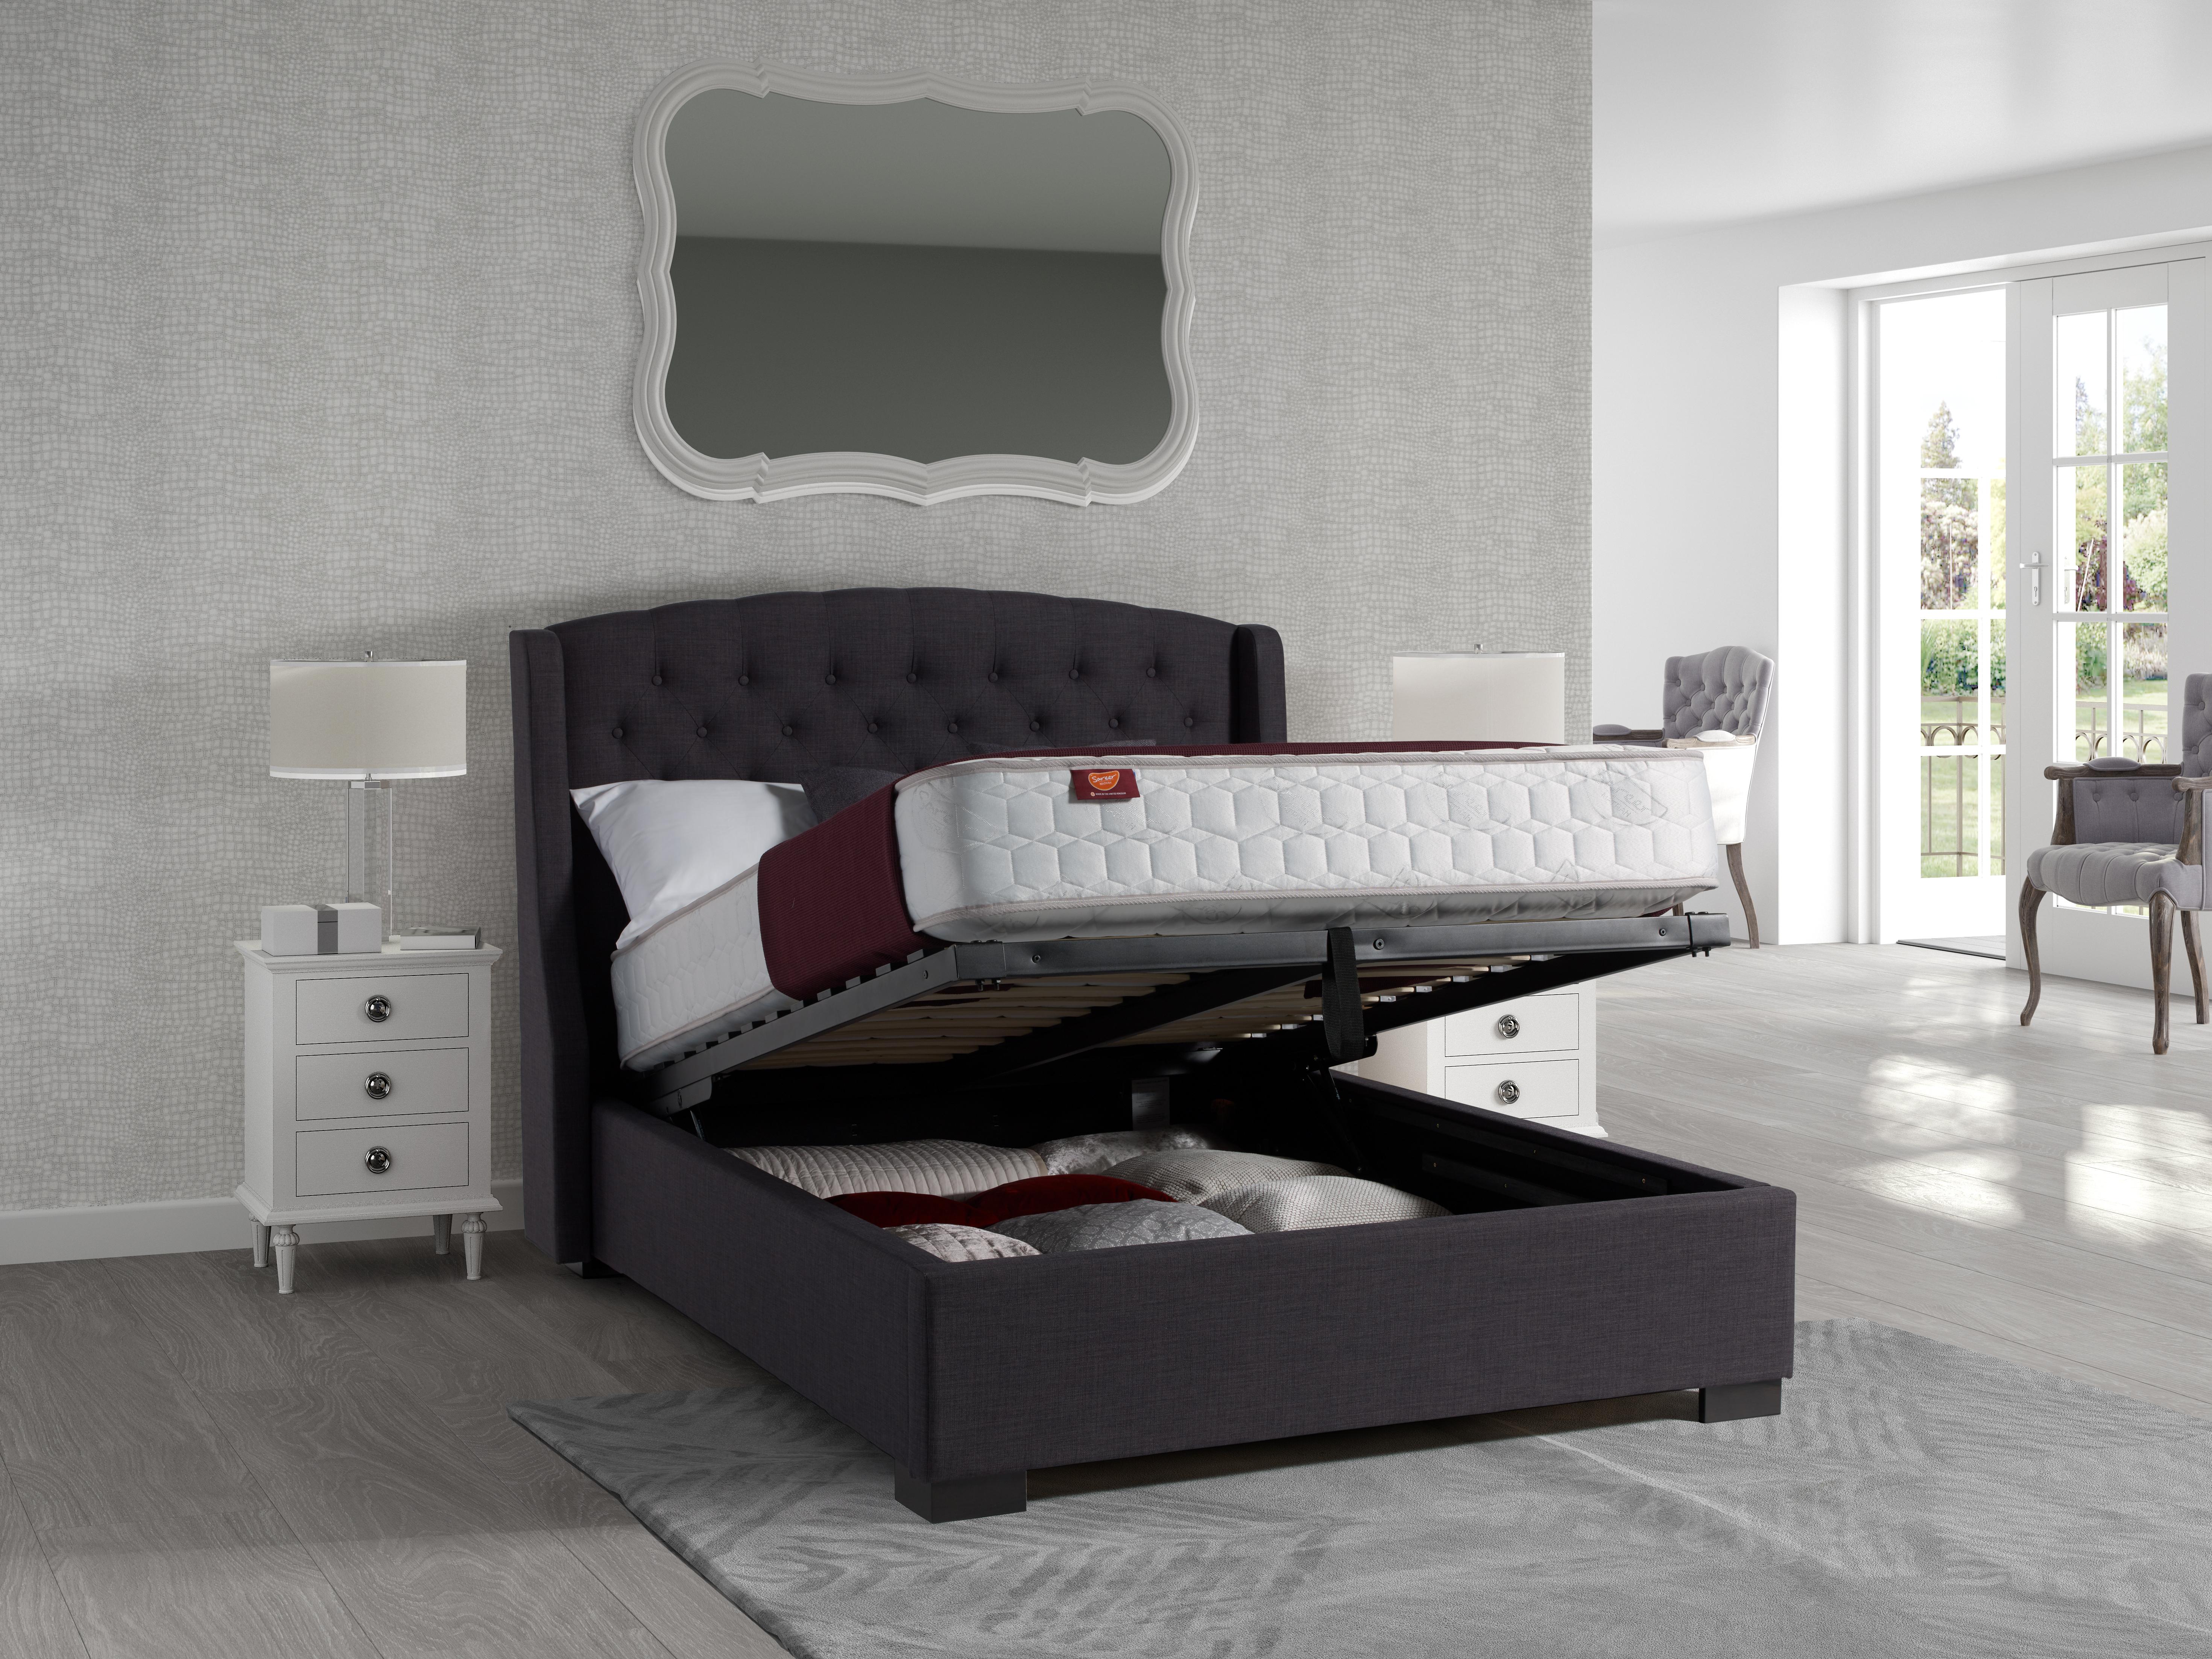 Sovereign Modern Ottoman Dark Grey 5ft King Size Bed Frame Bedroom